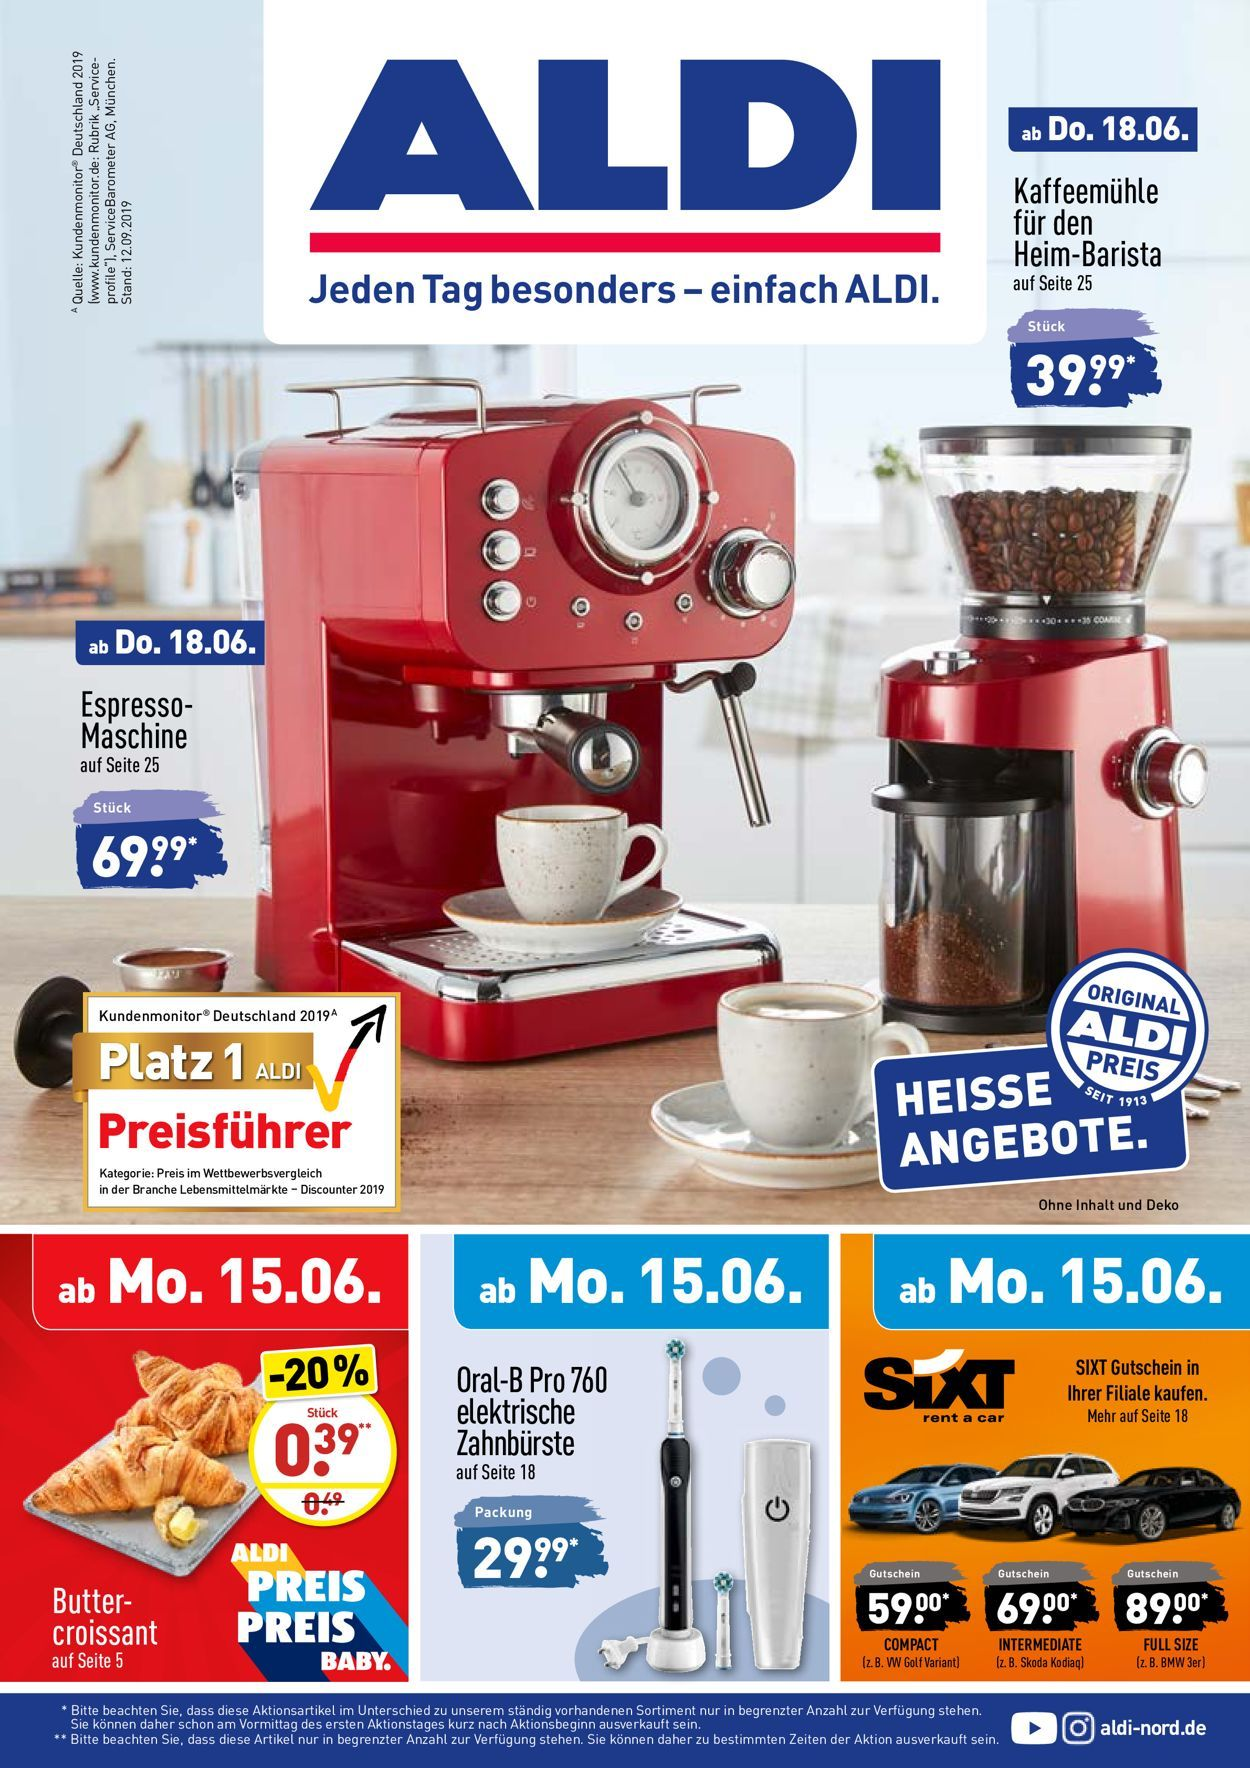 Aldi Prospekt Gartenmobel 2020 In 2021 Aldi Prospekt Aldi Espresso Maschine